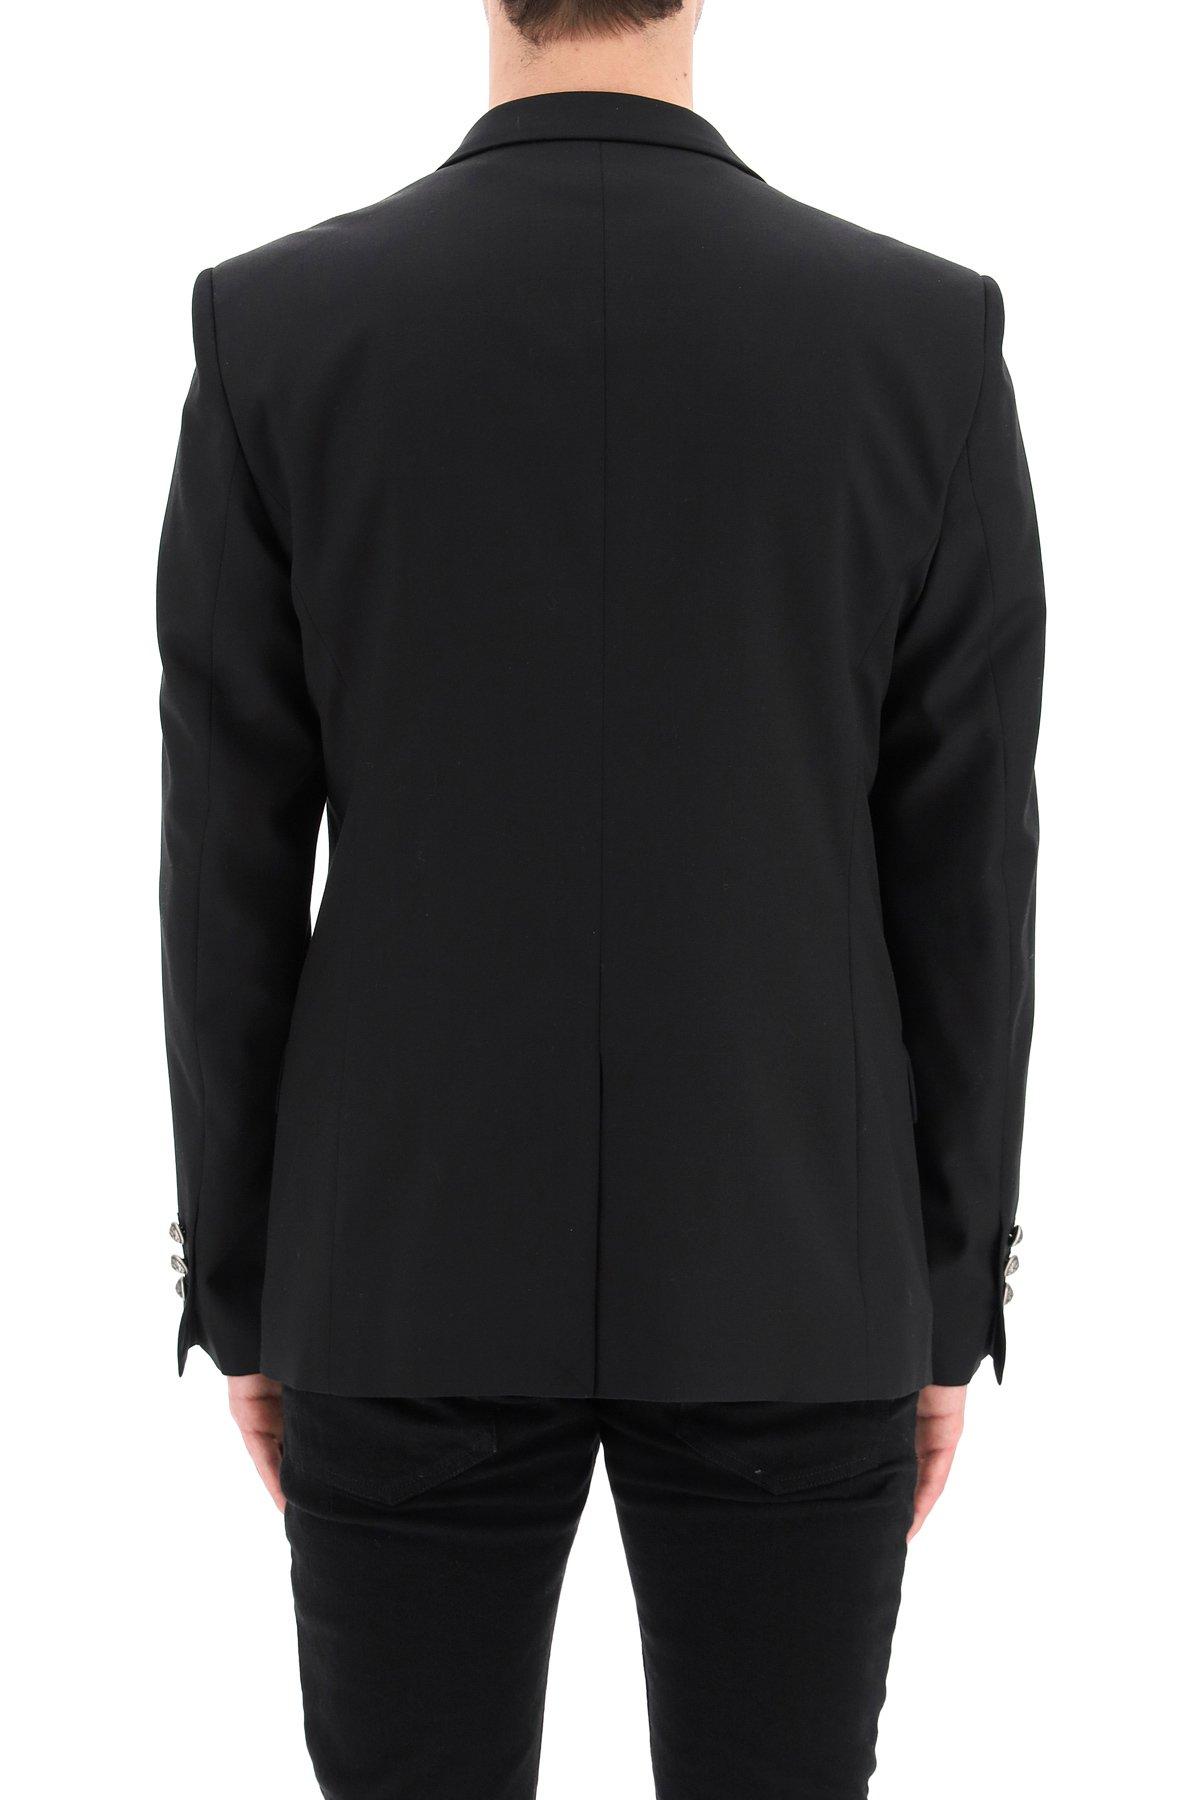 Balmain blazer aperto